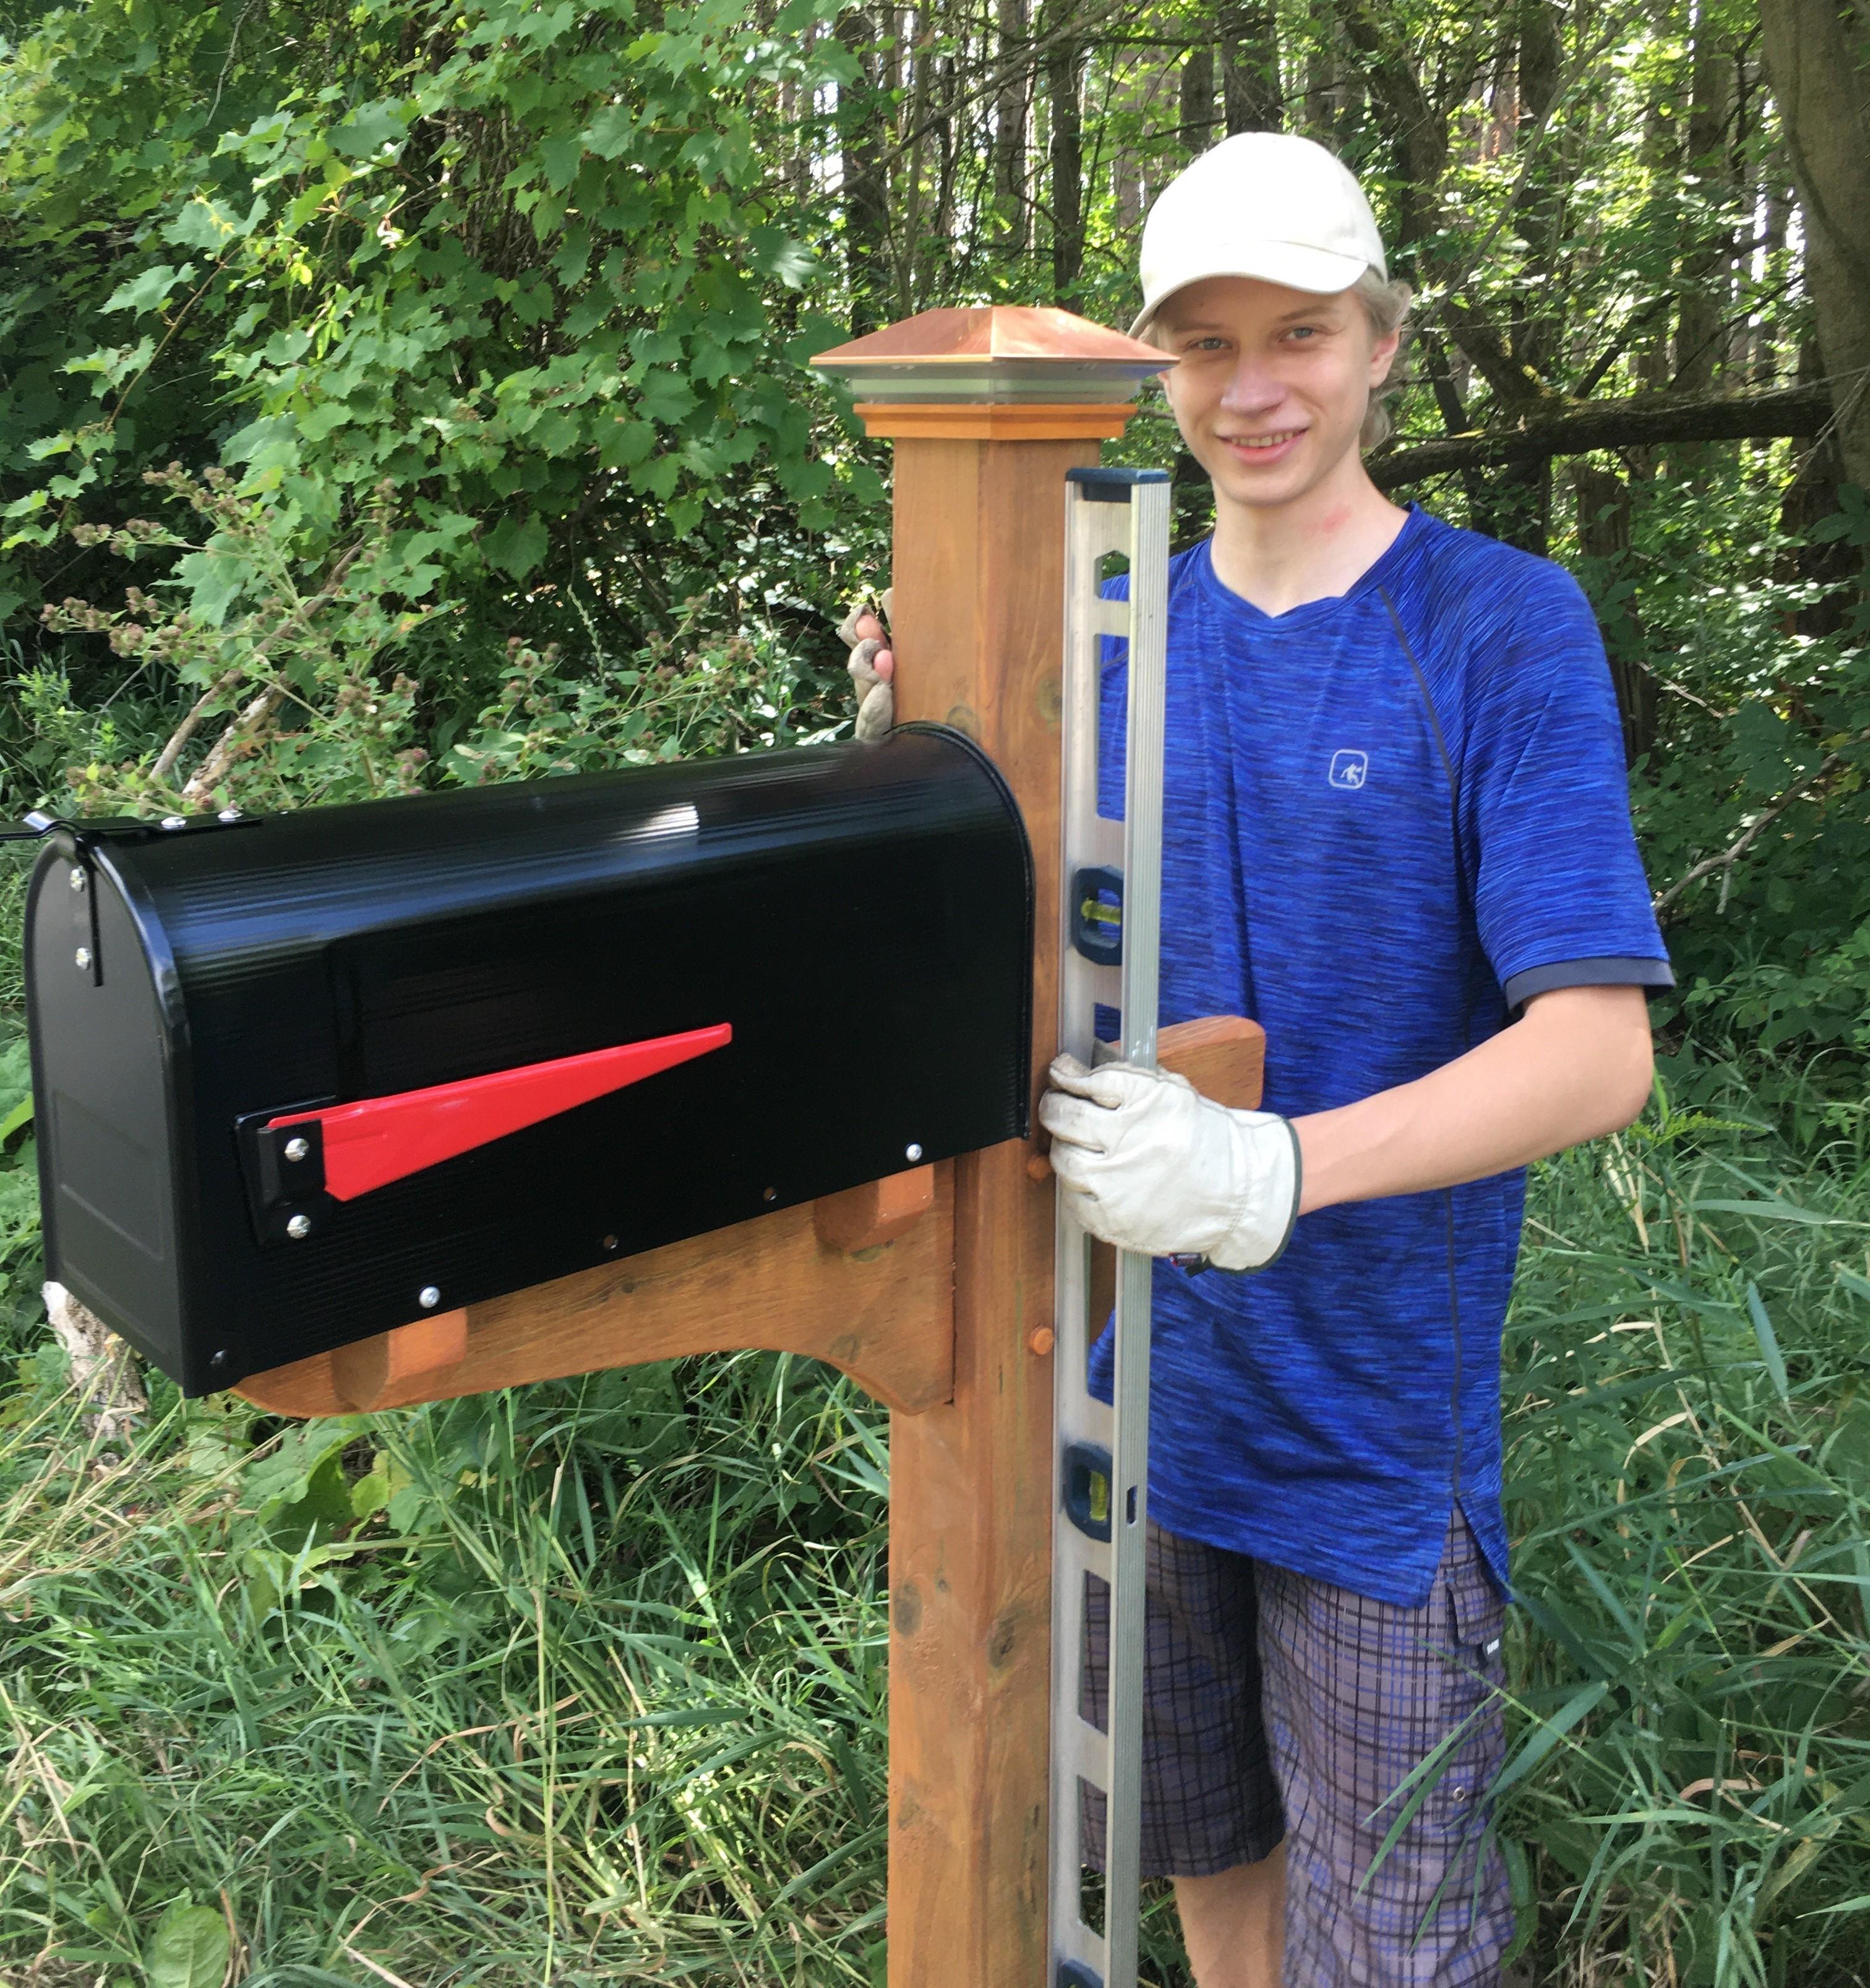 Thomas from the Mailbox Studio